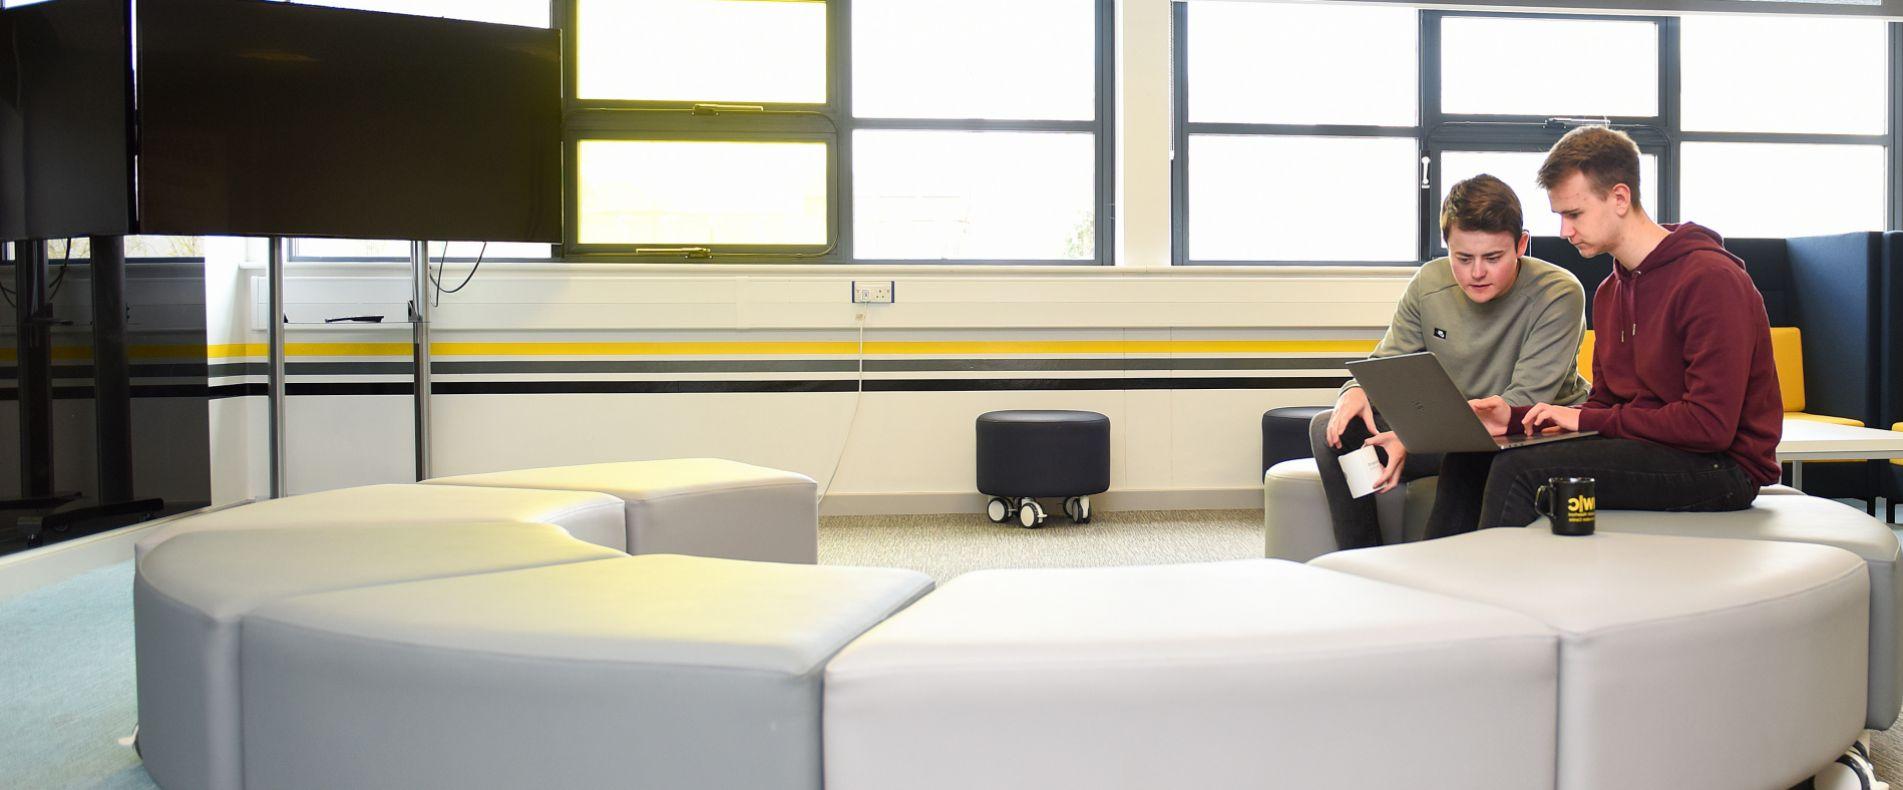 IWIC Co-work, Hot-desk, Co-Lab, Ideas, Space